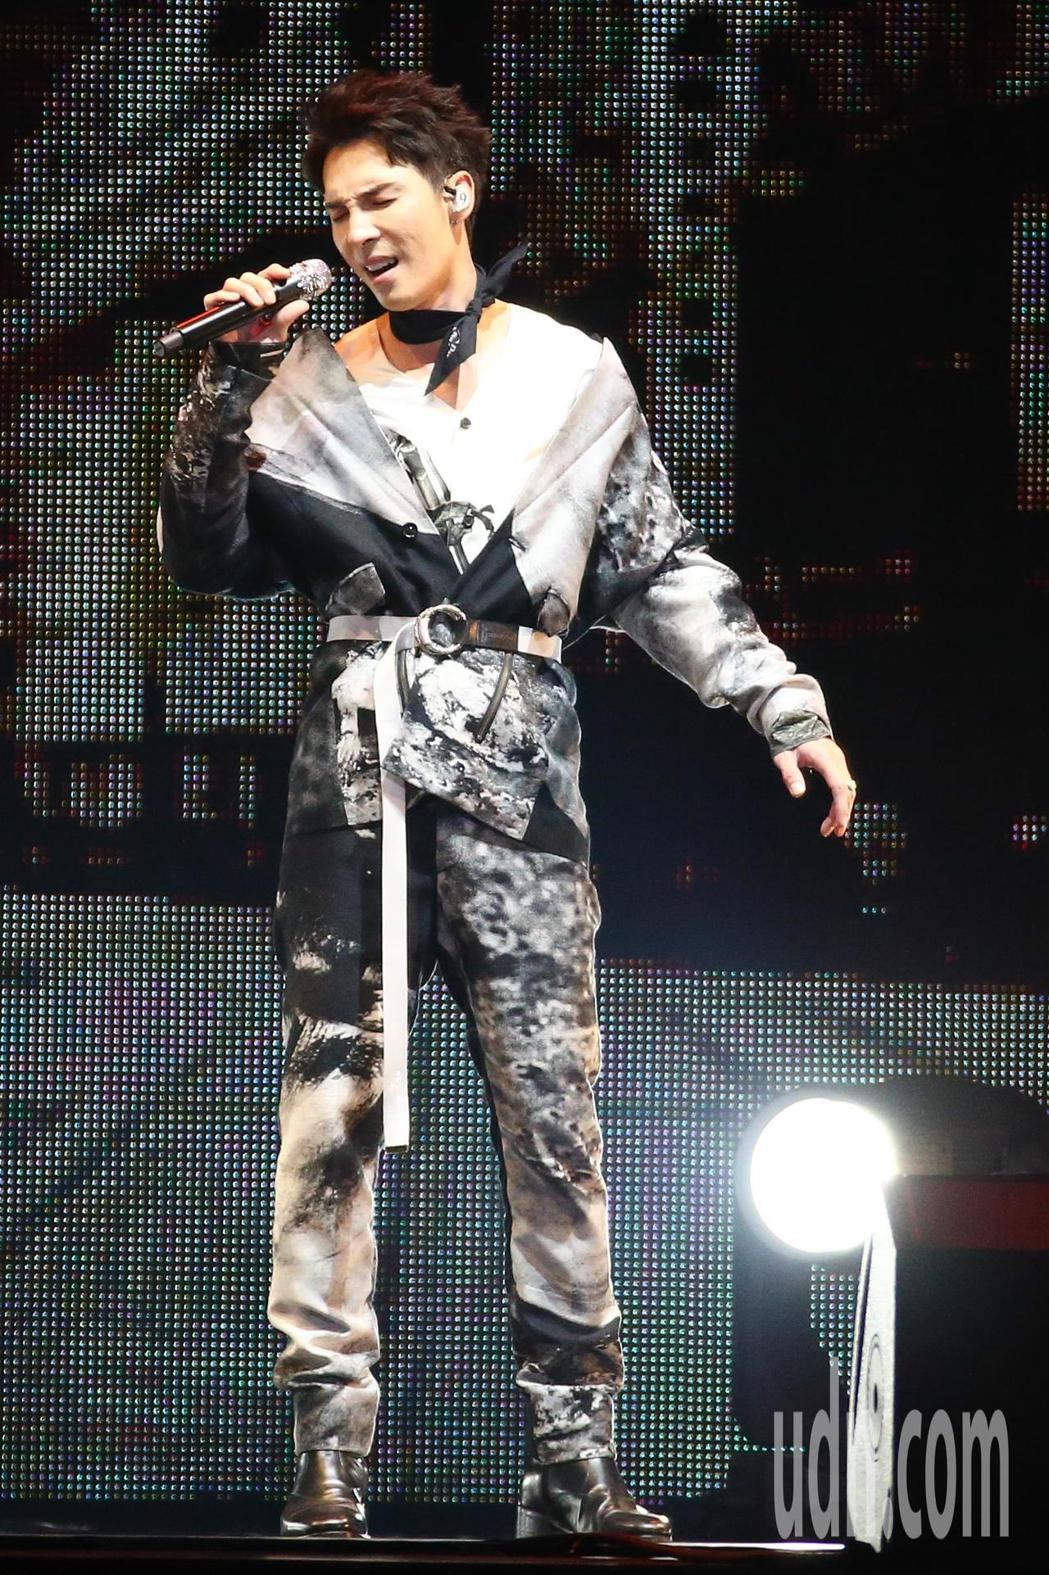 2019 hito流行音樂獎頒獎典禮今天在小巨蛋舉行,陳勢安擔任表演嘉賓演唱《與